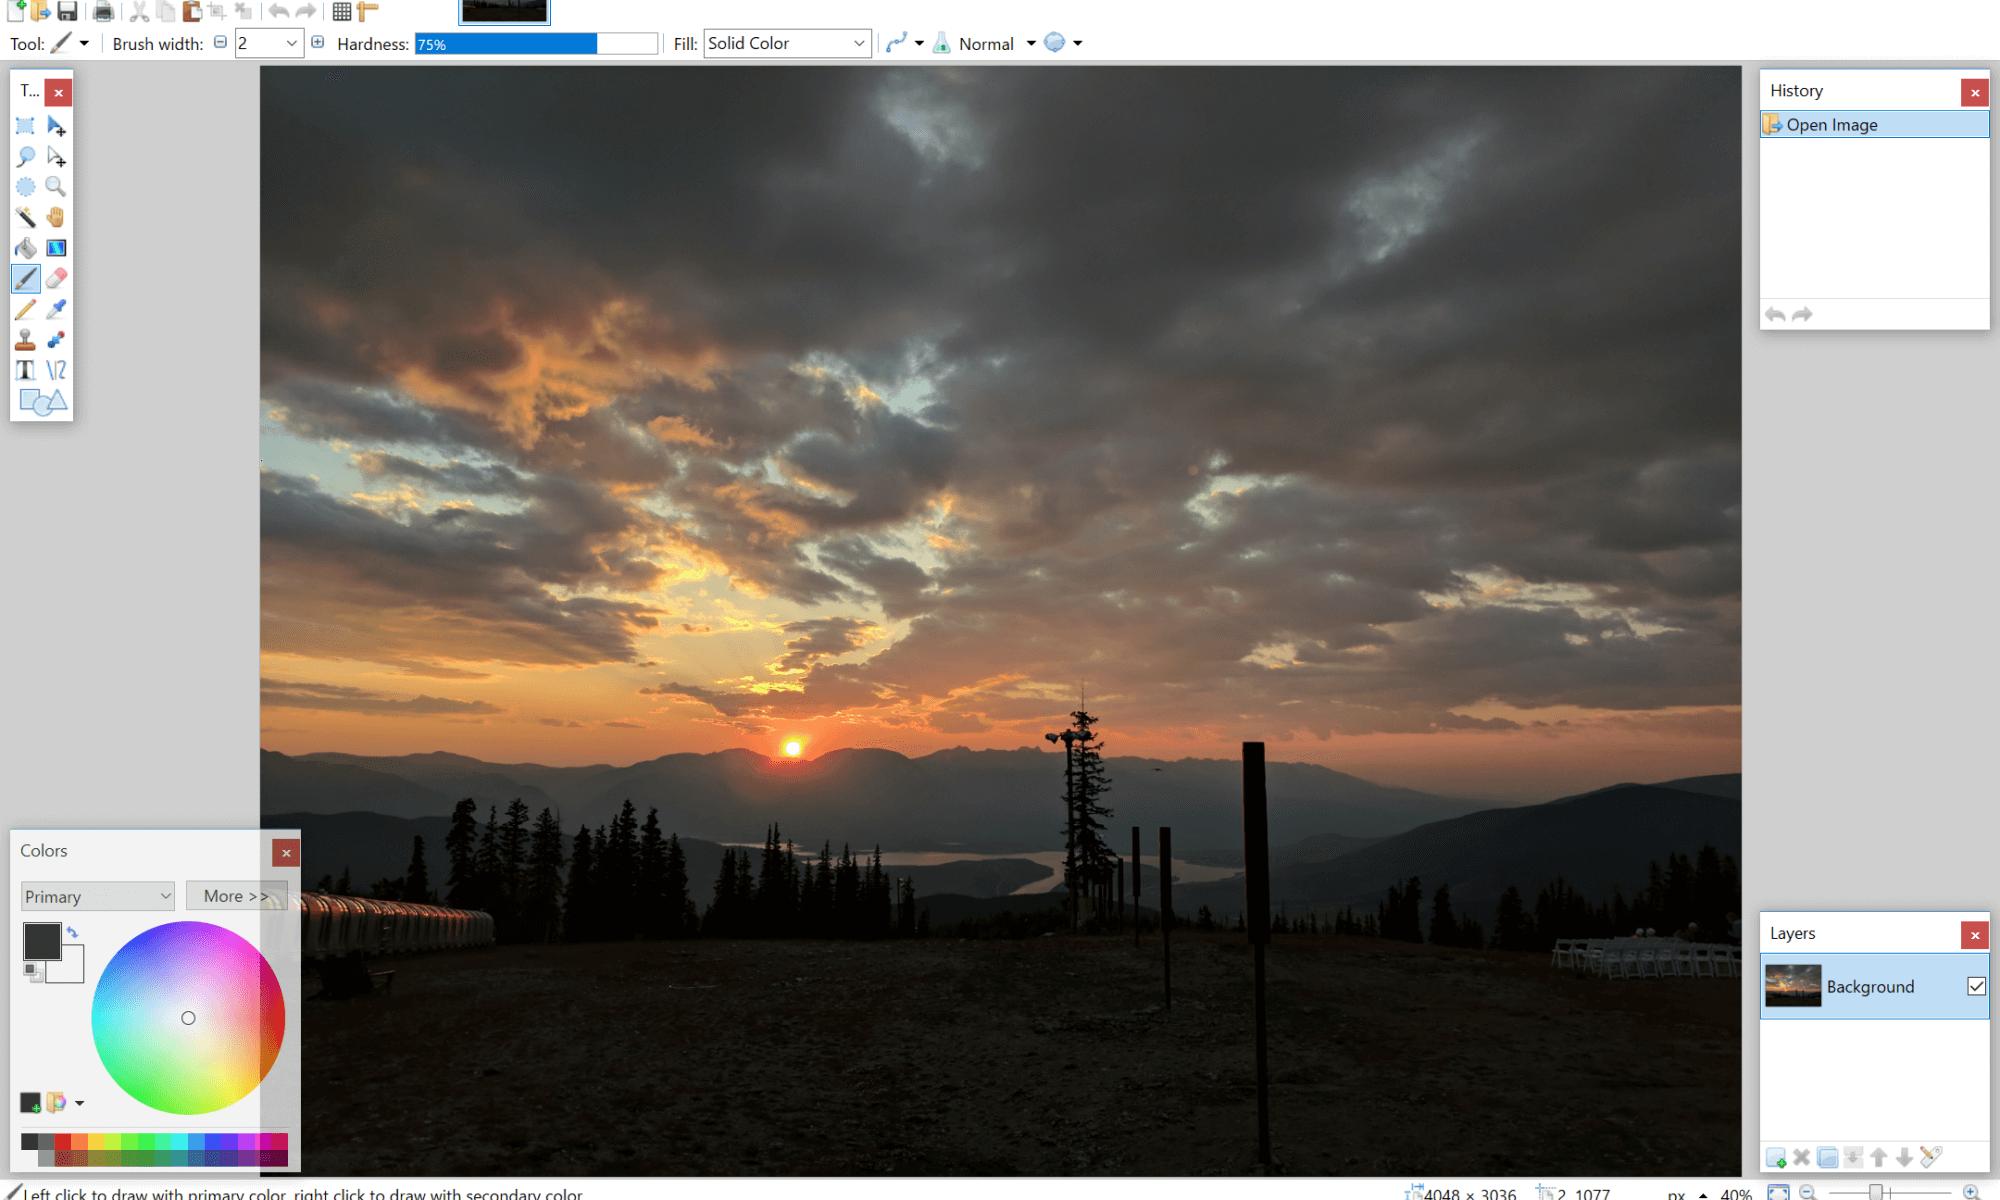 Paint.net for Windows 10